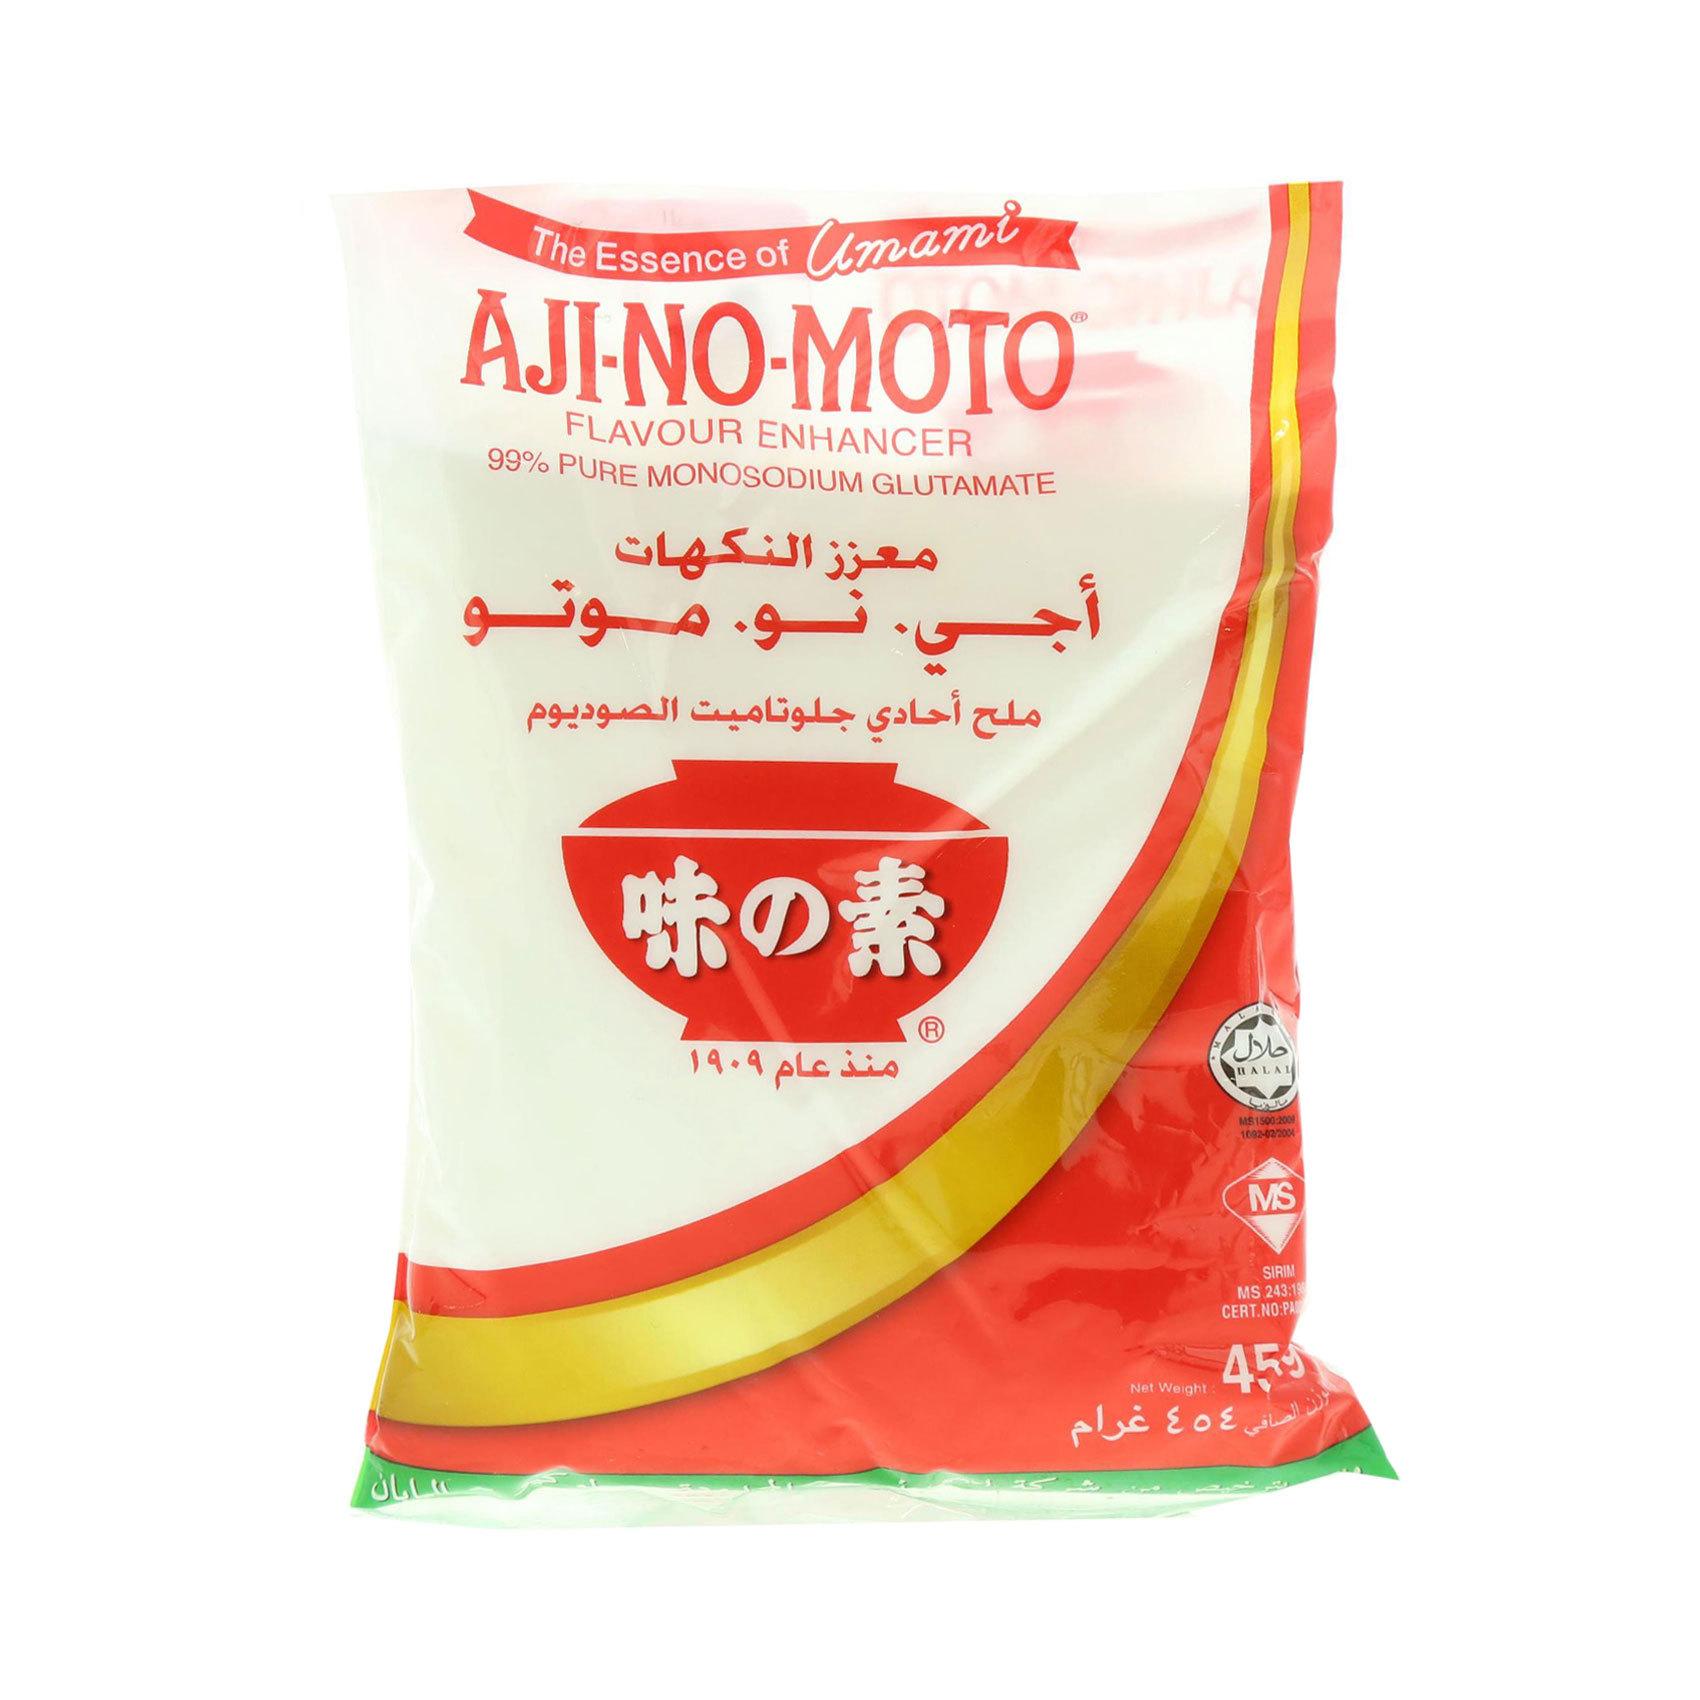 AJINOMOTO 454GR